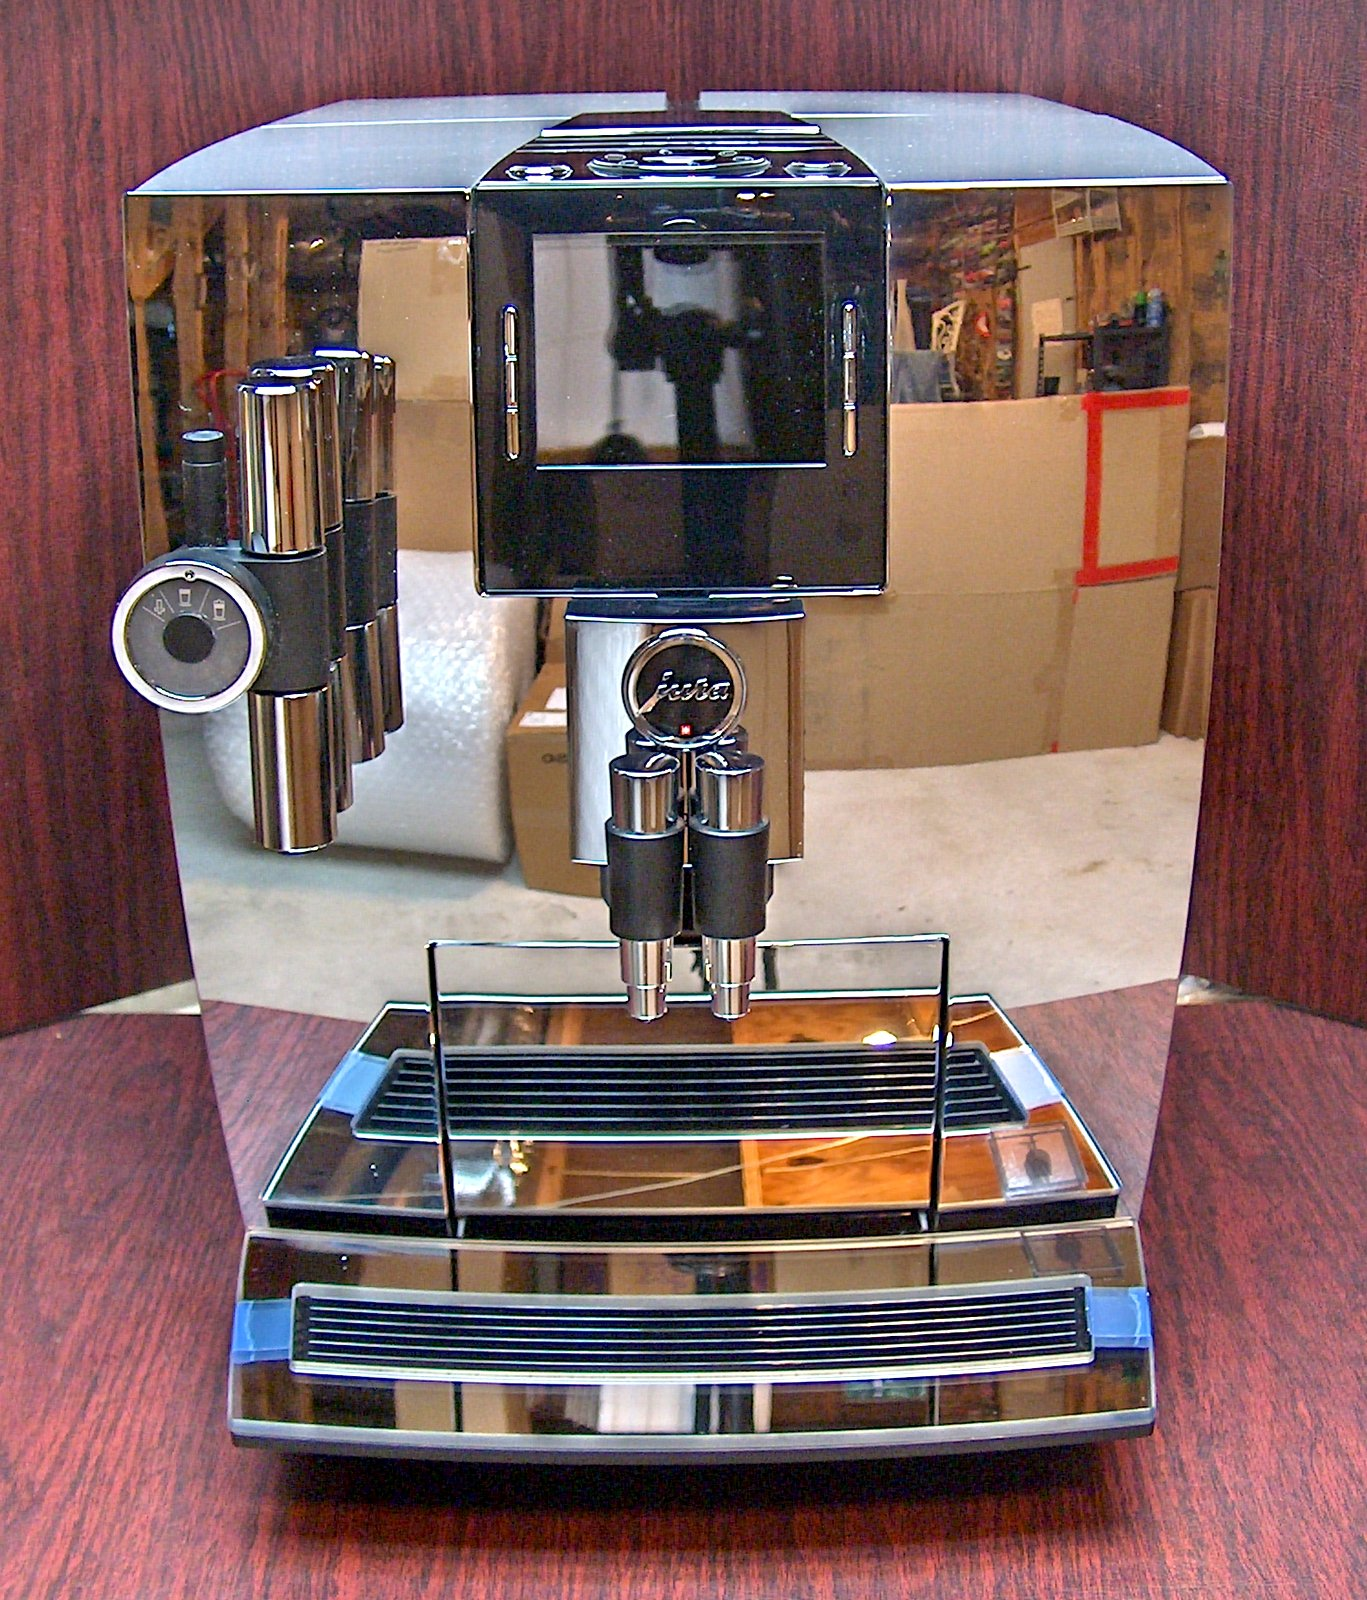 Jura Impressa J90 Chrome Tft One Touch Super Automatic Espresso Machine